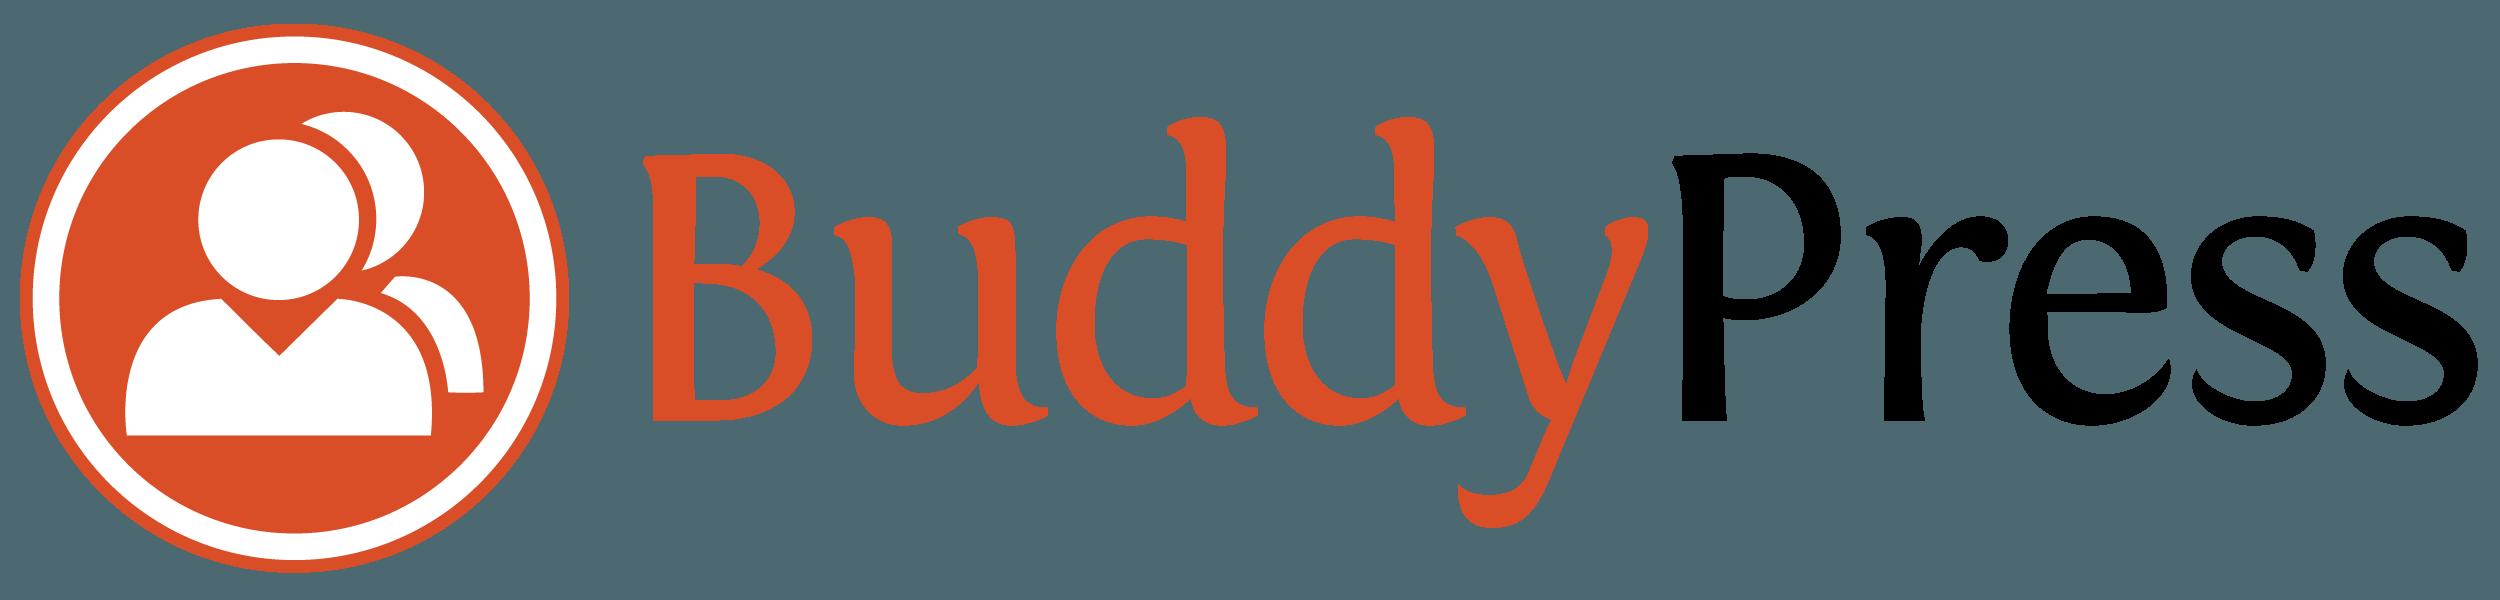 BuddyPress 2.0 viene con esteroides